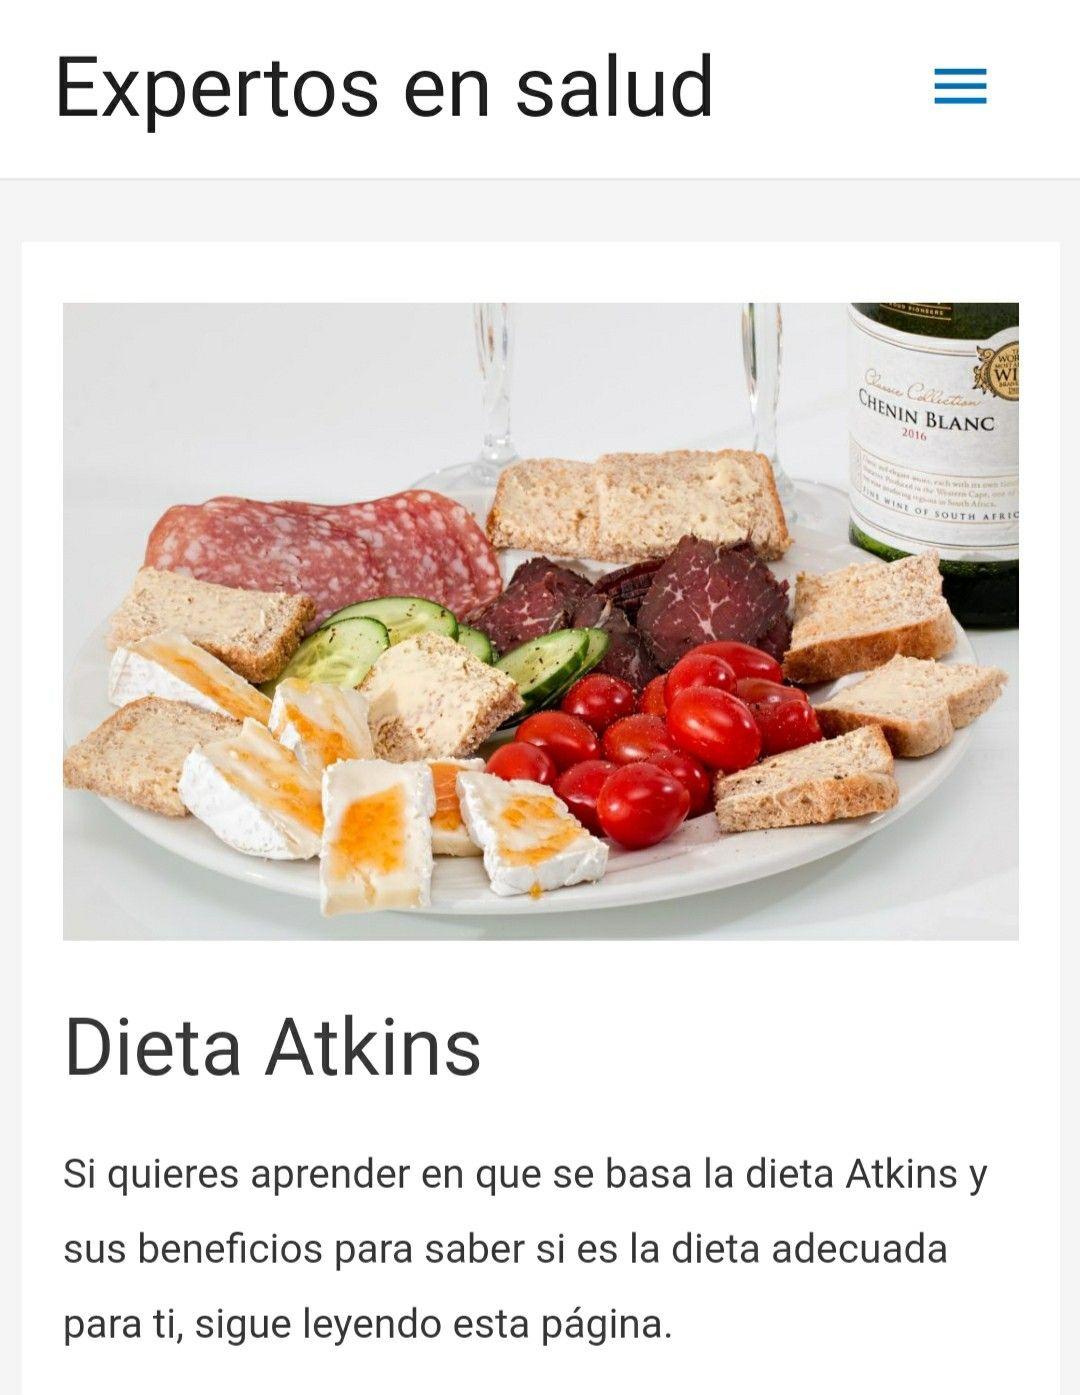 Descubre la dieta Atkins